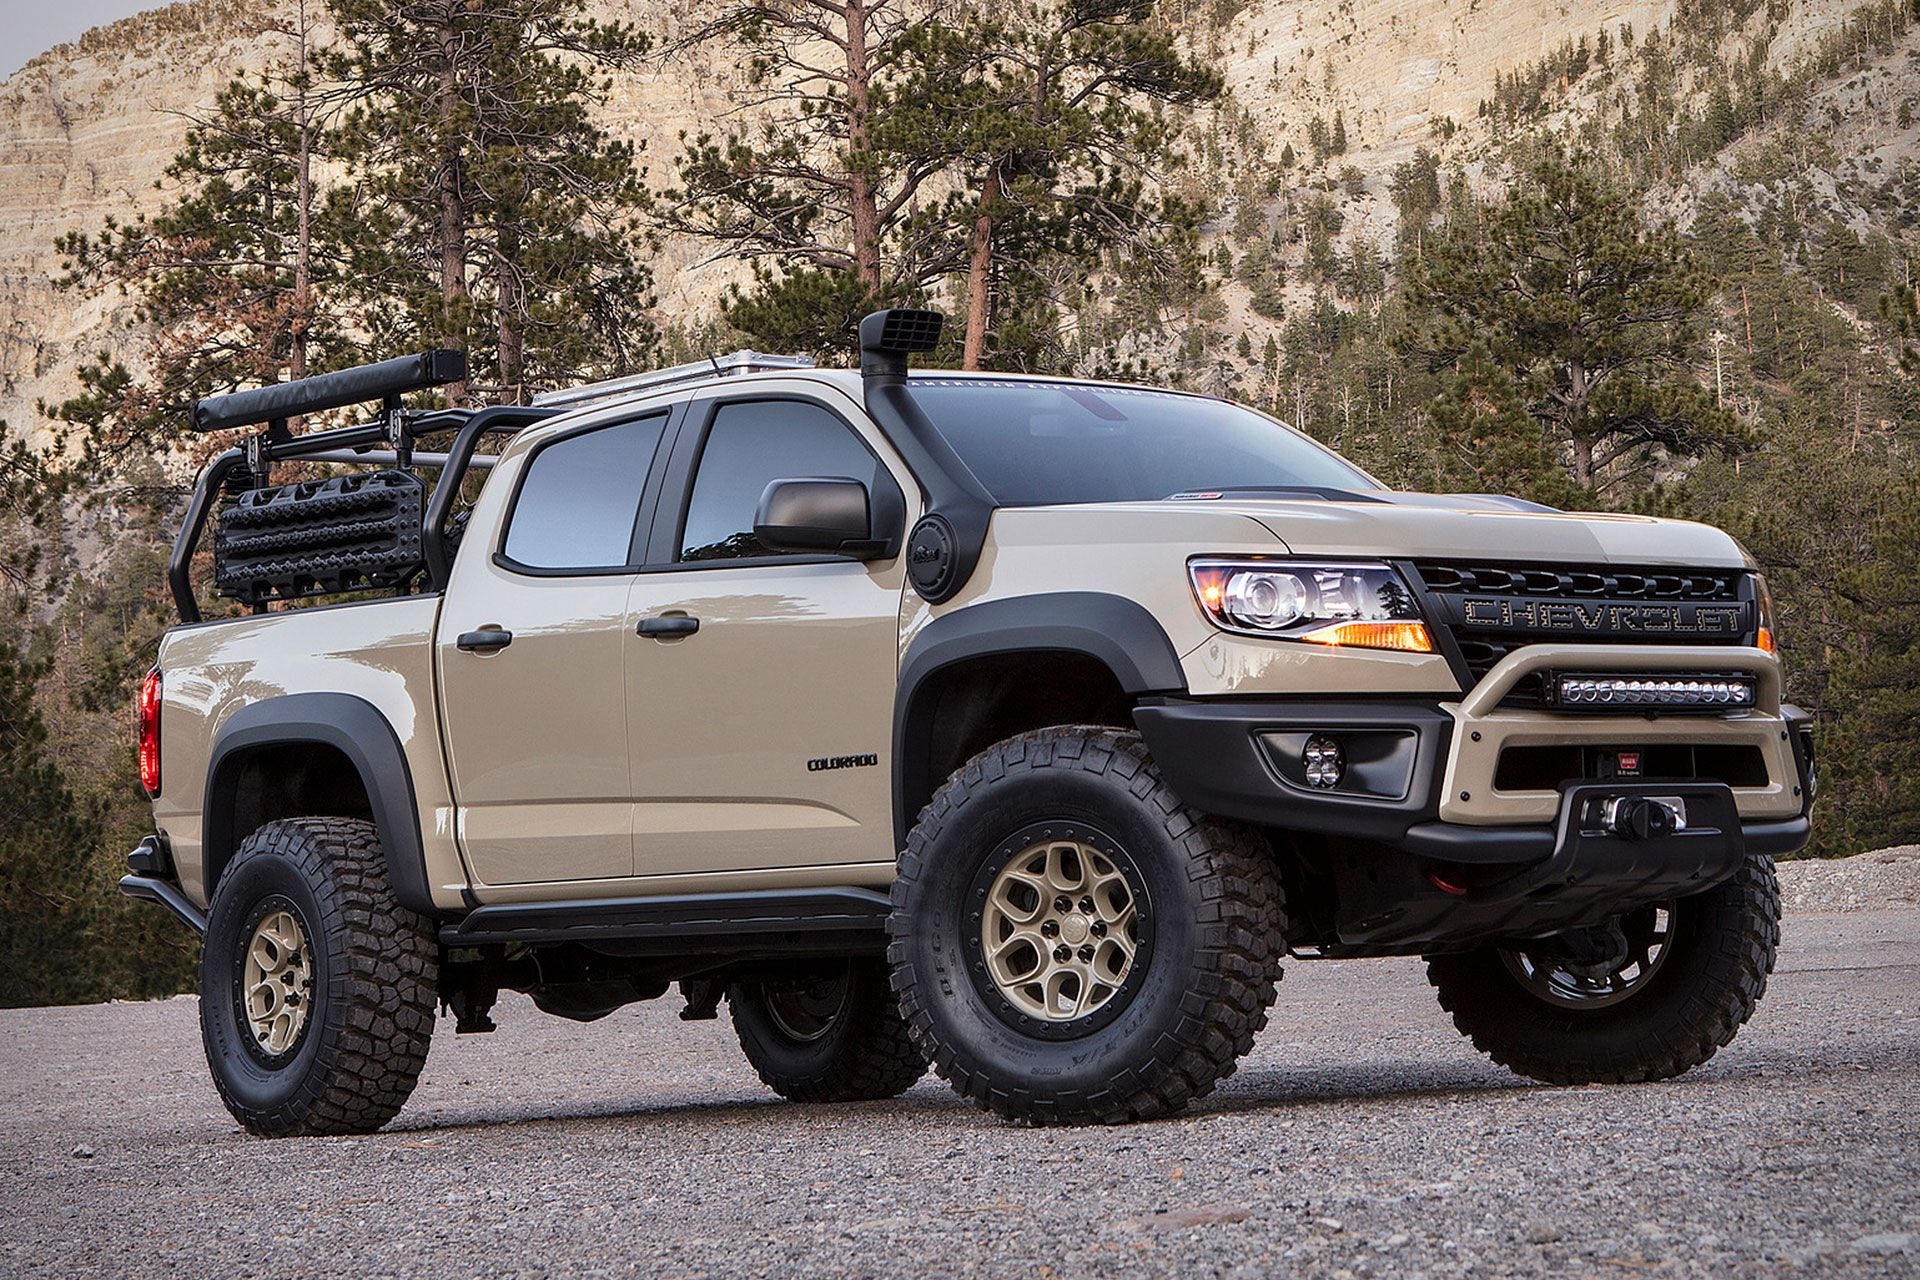 Chevrolet Colorado Zr2 Aev Concept Truck Gmc Trucks Nissan Titan Xd Trucks